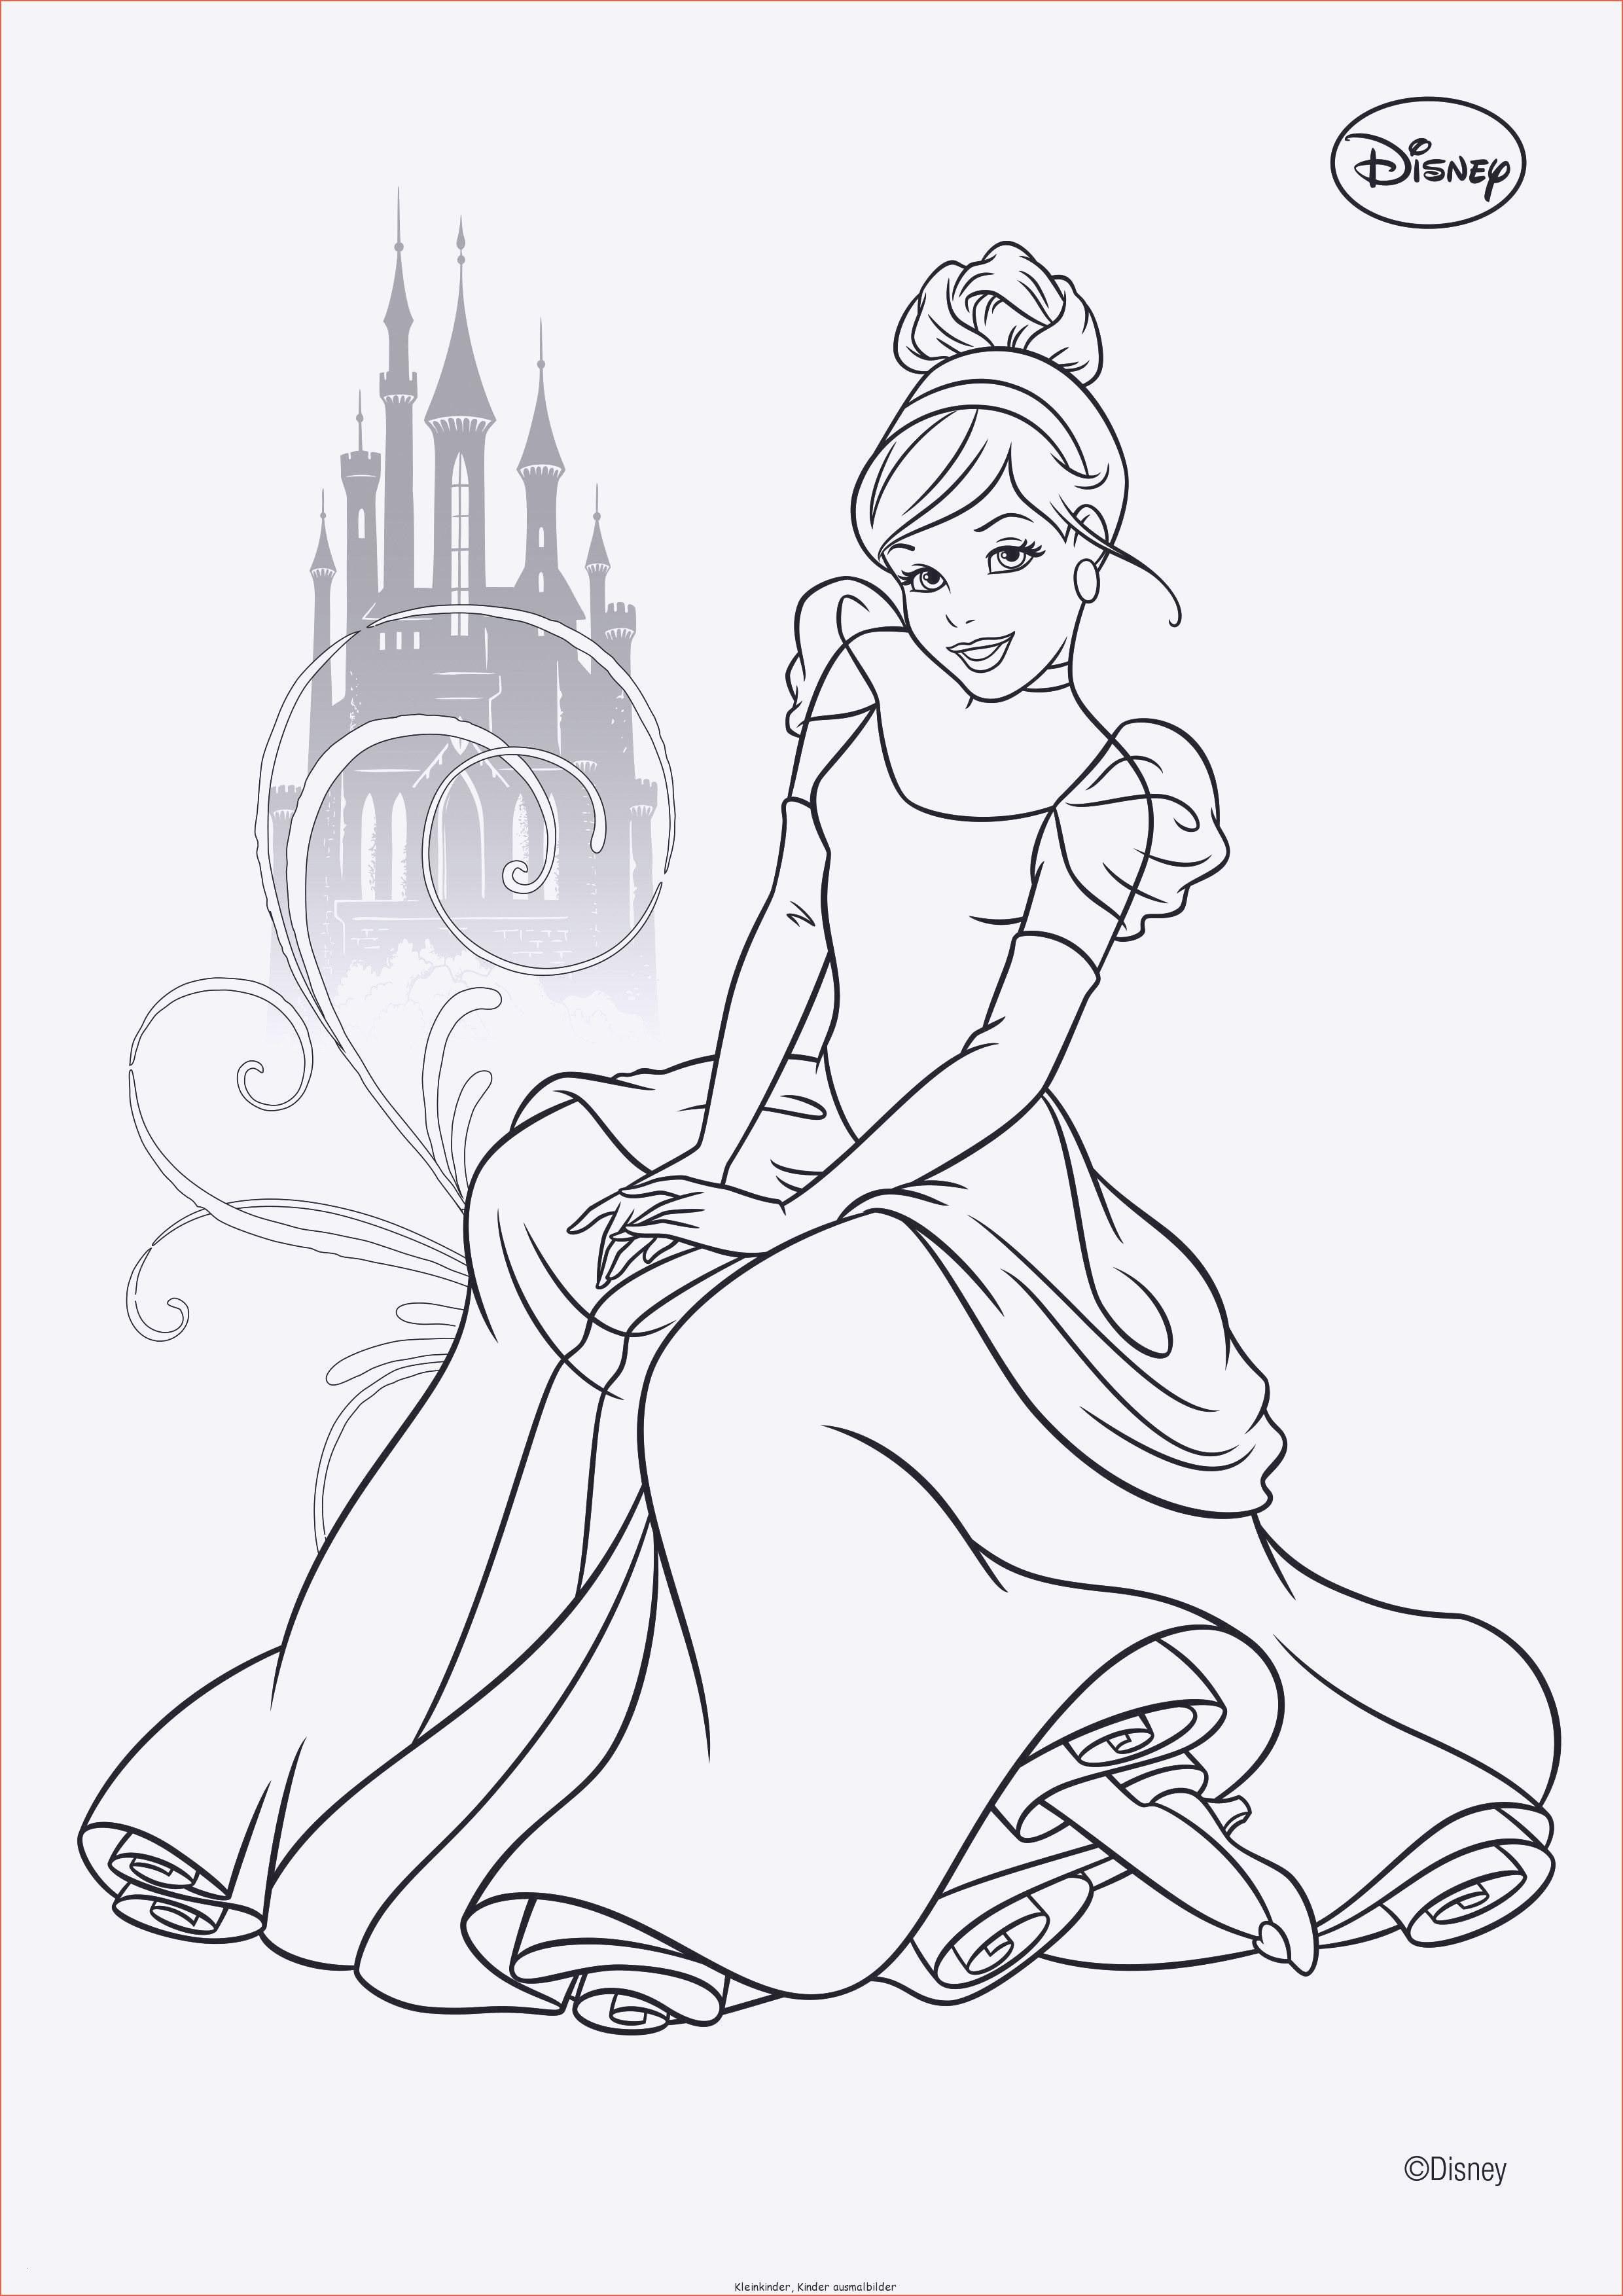 Ausmalbilder Kostenlos Minions Genial 37 Kostenlose Ausmalbilder Elsa Scoredatscore Luxus Minion Stock